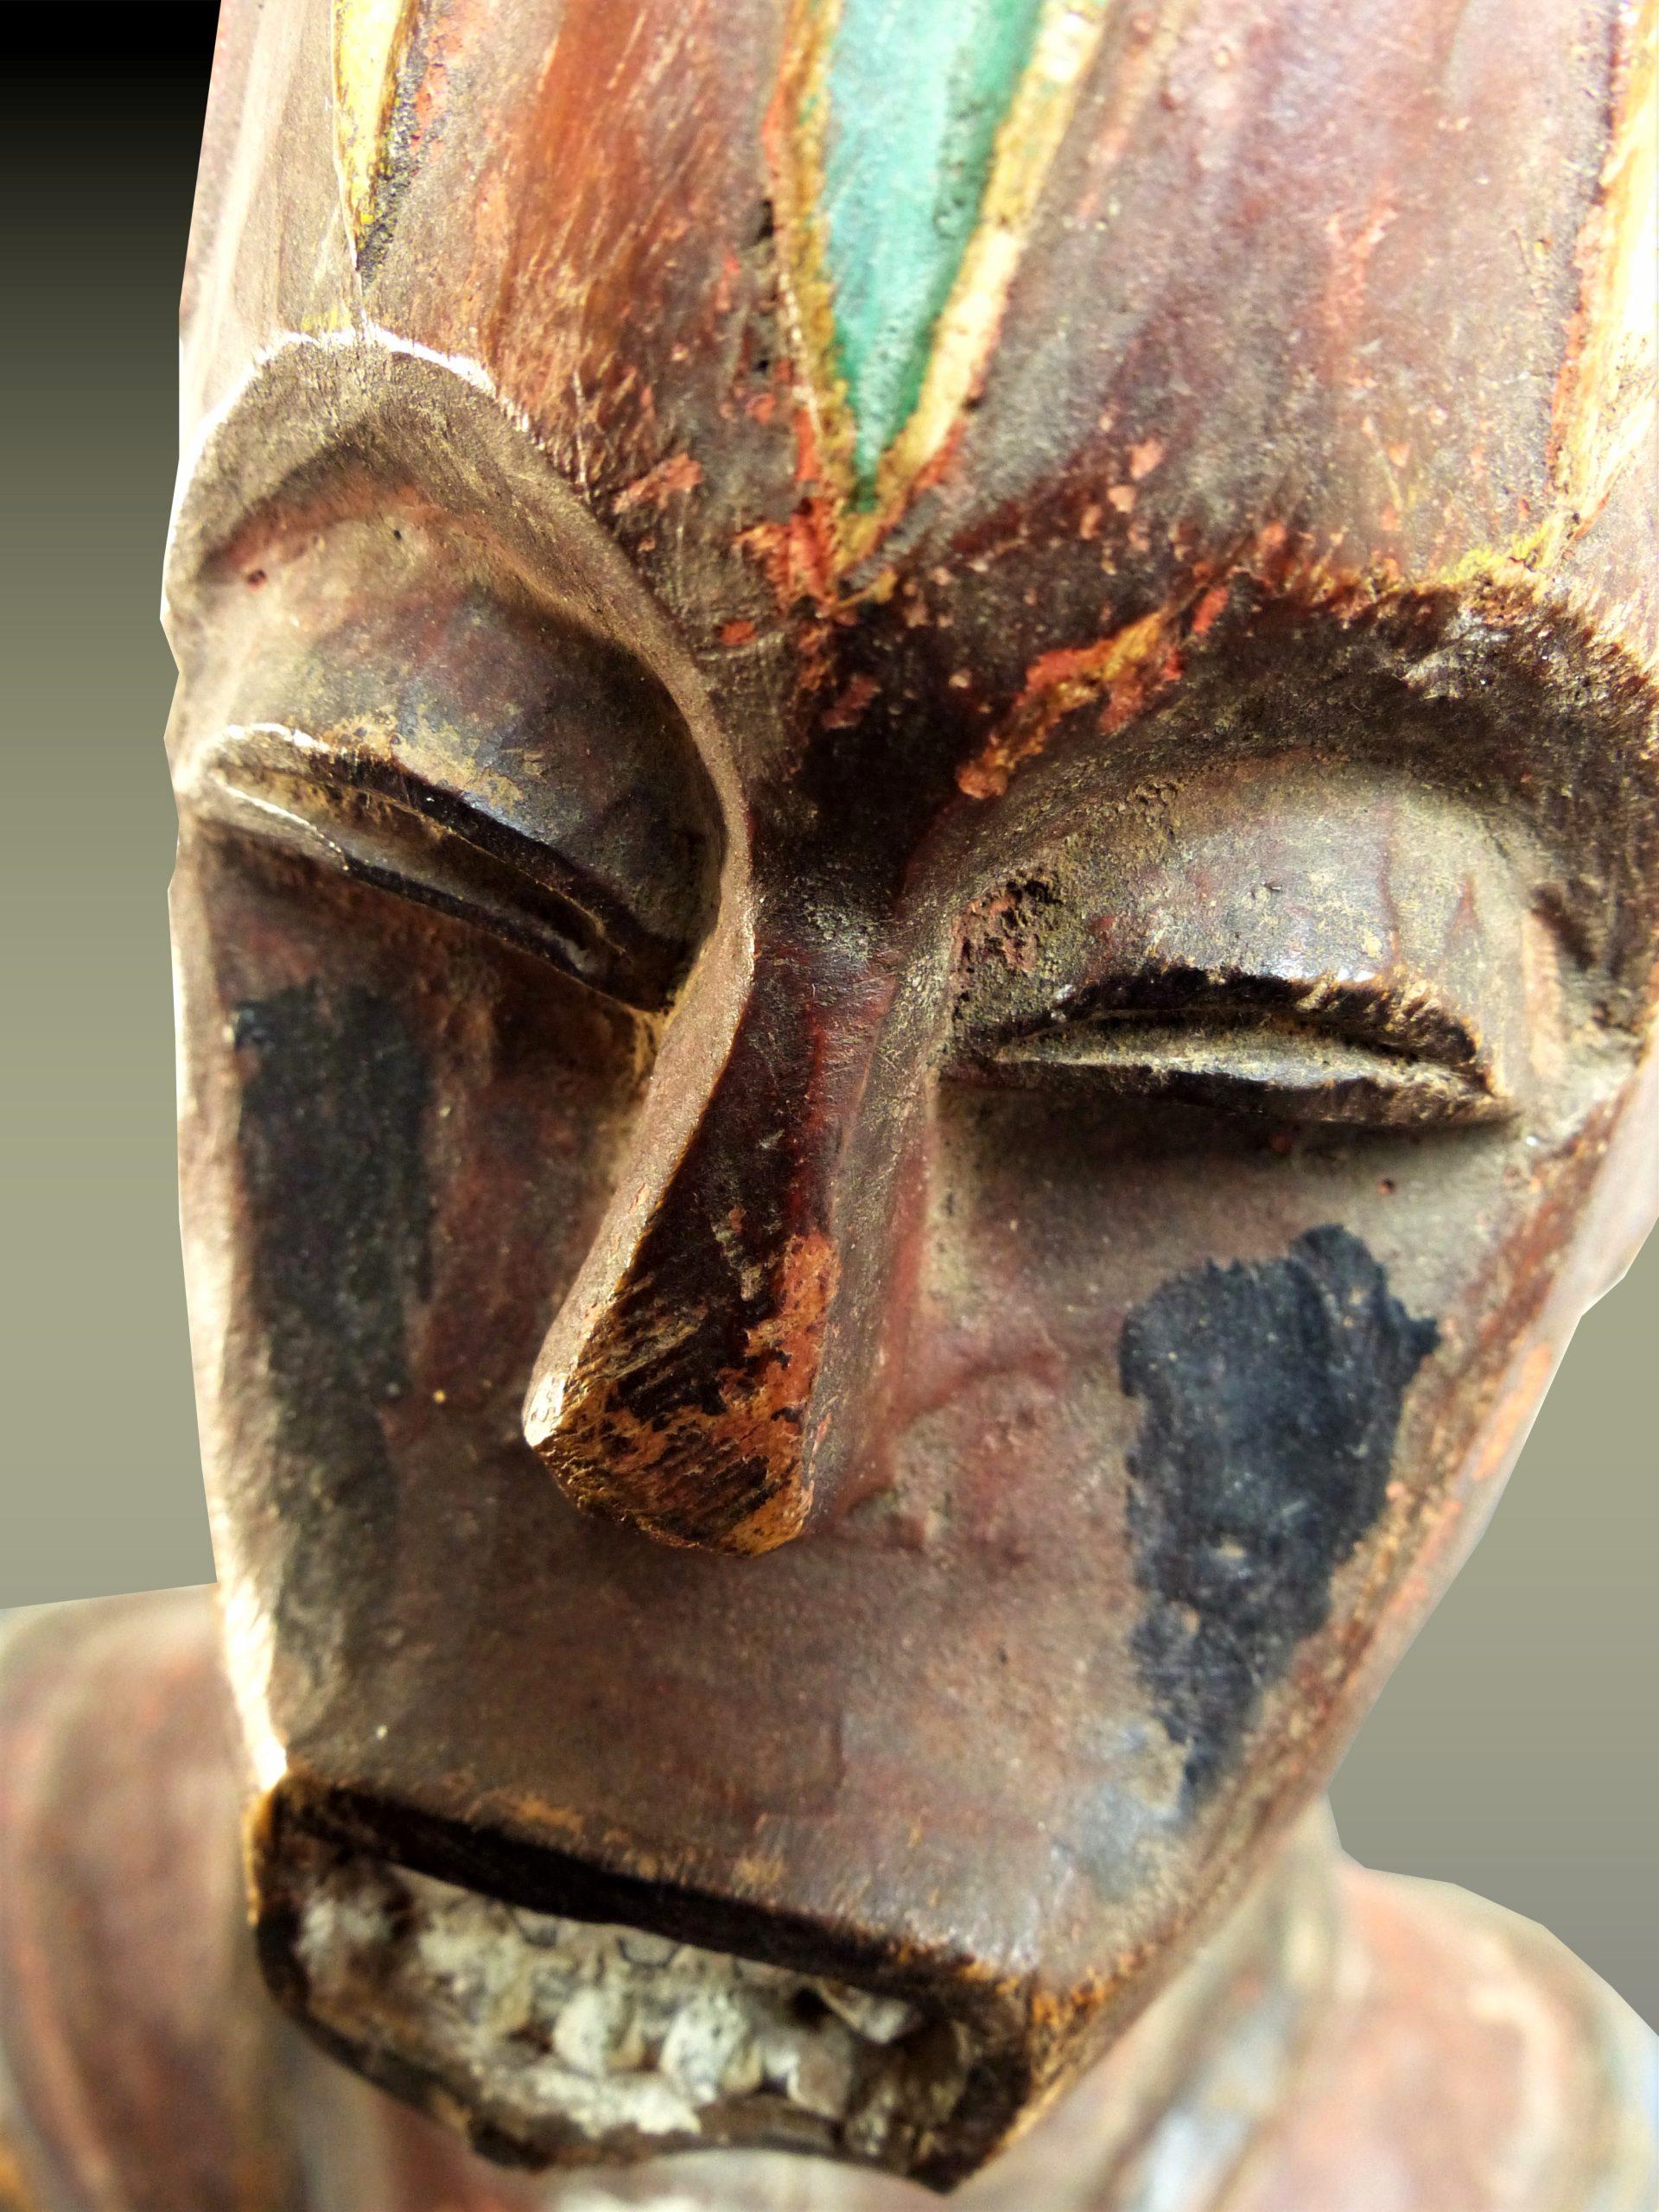 urhobo visage plongée